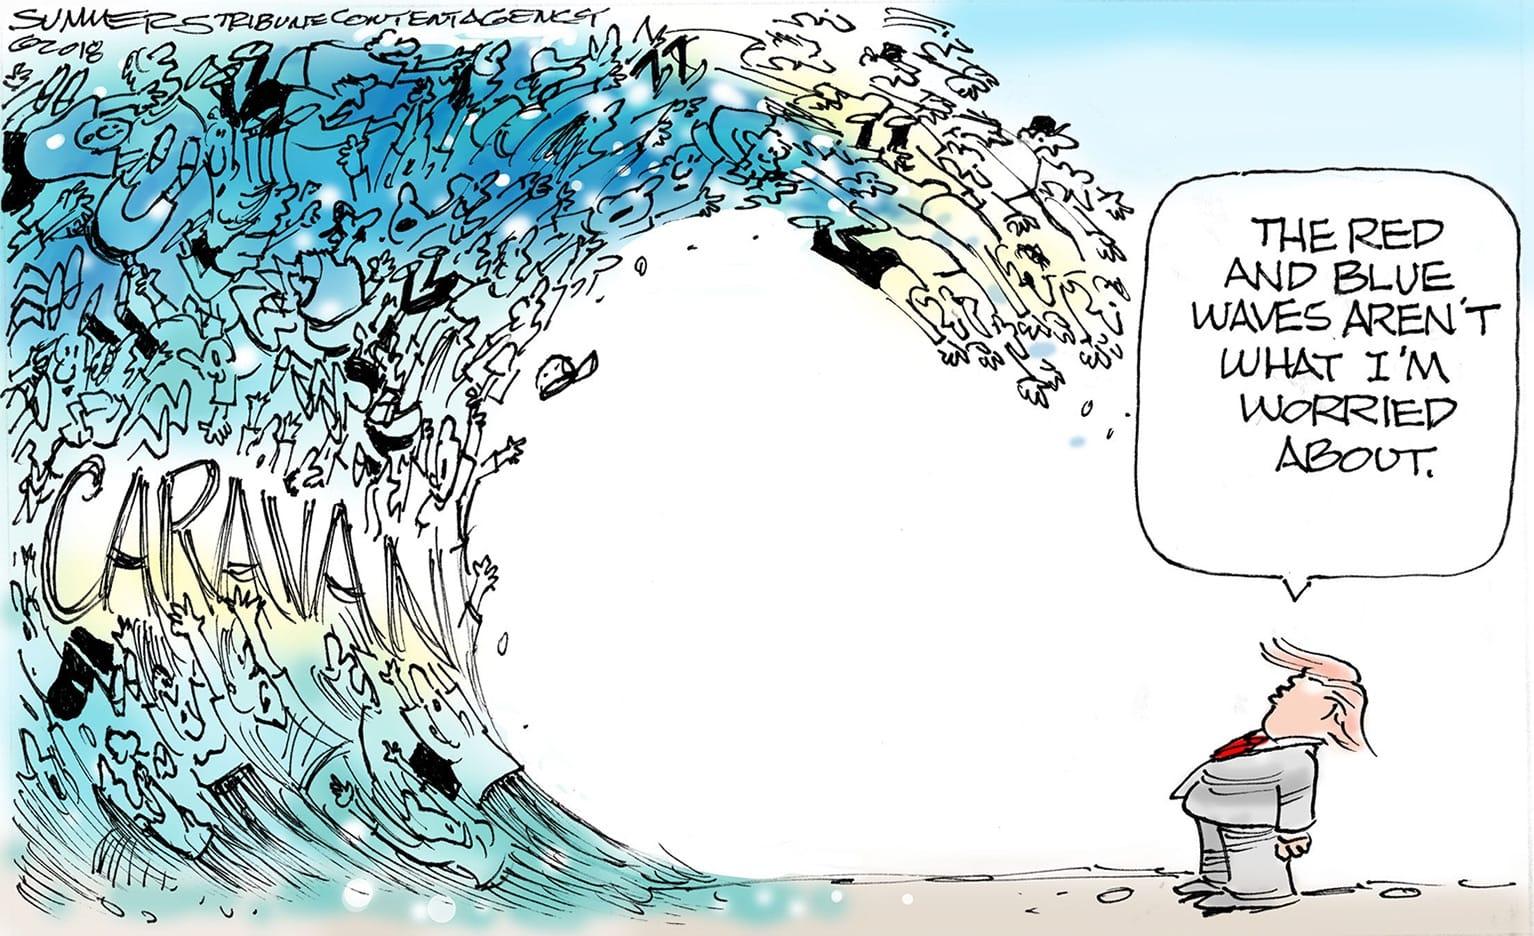 Oct. 27: Migrant Wave